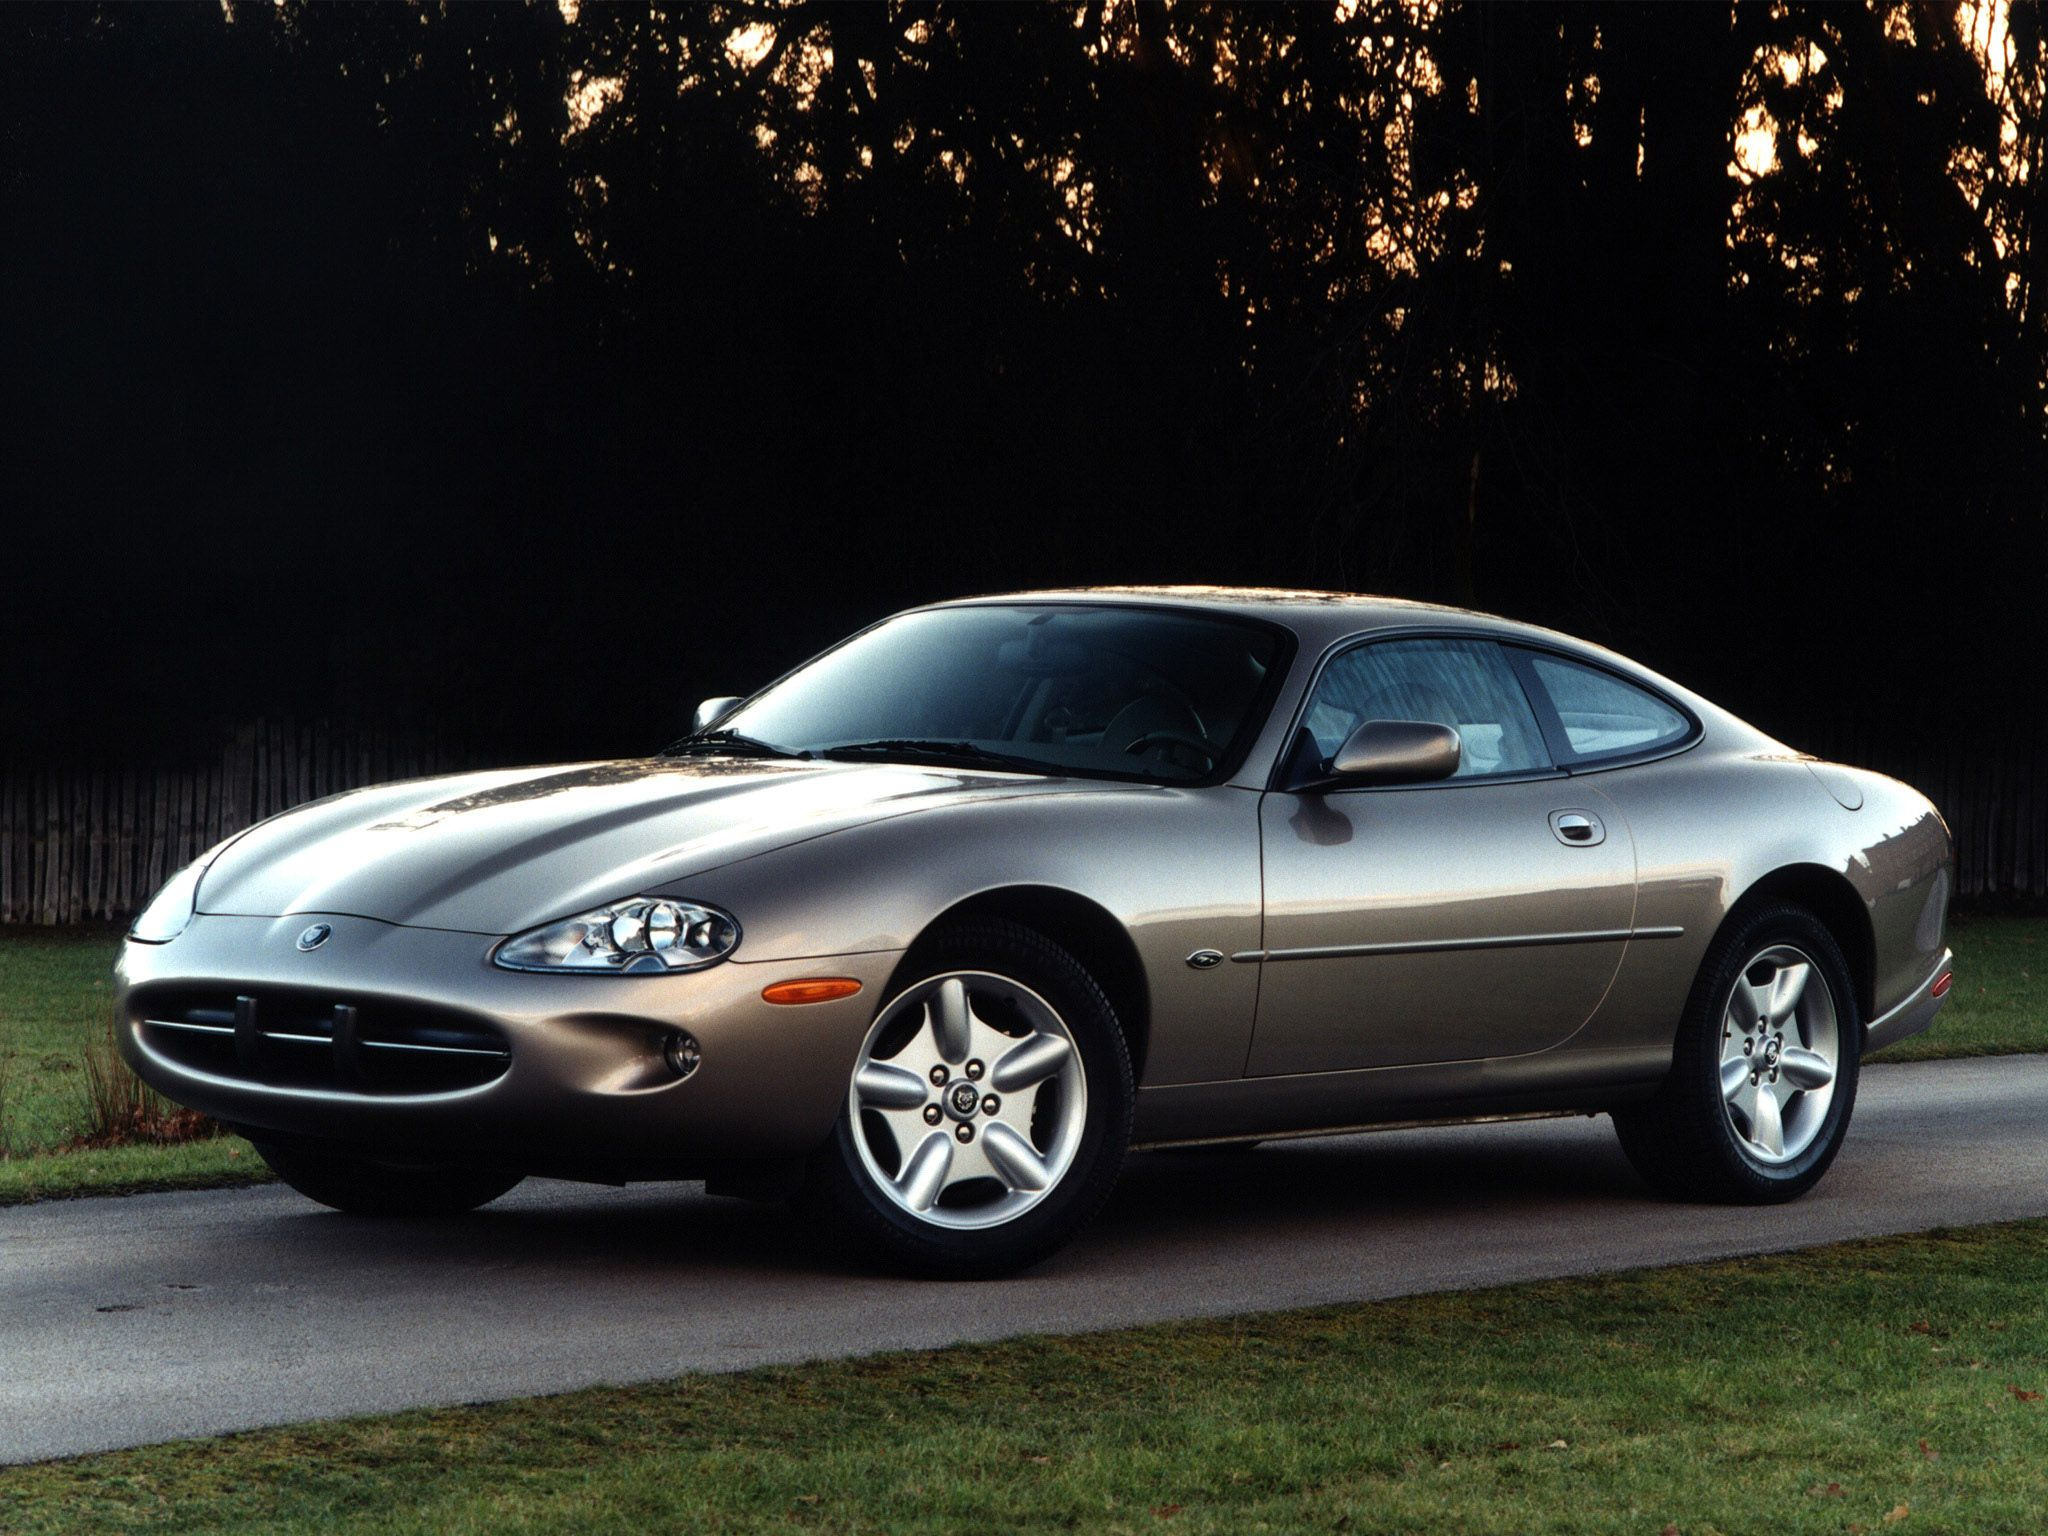 jaguar xk8 - unkind to describe it as a poor man's aston martin as